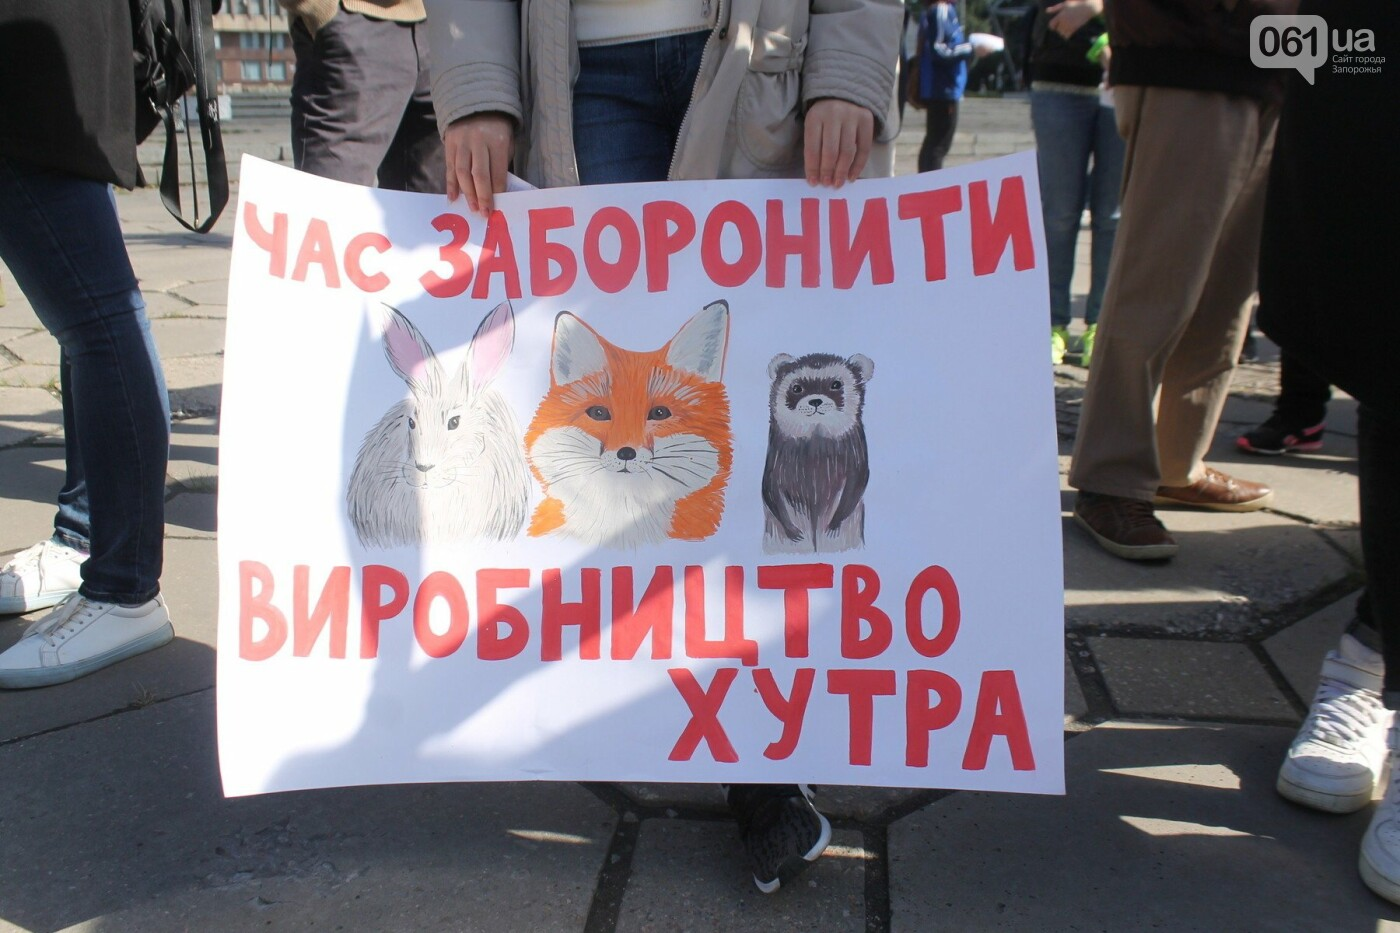 «Защити! Не мучай»: в Запорожье провели марш за права животных, – ФОТОРЕПОРТАЖ, ВИДЕО, фото-7